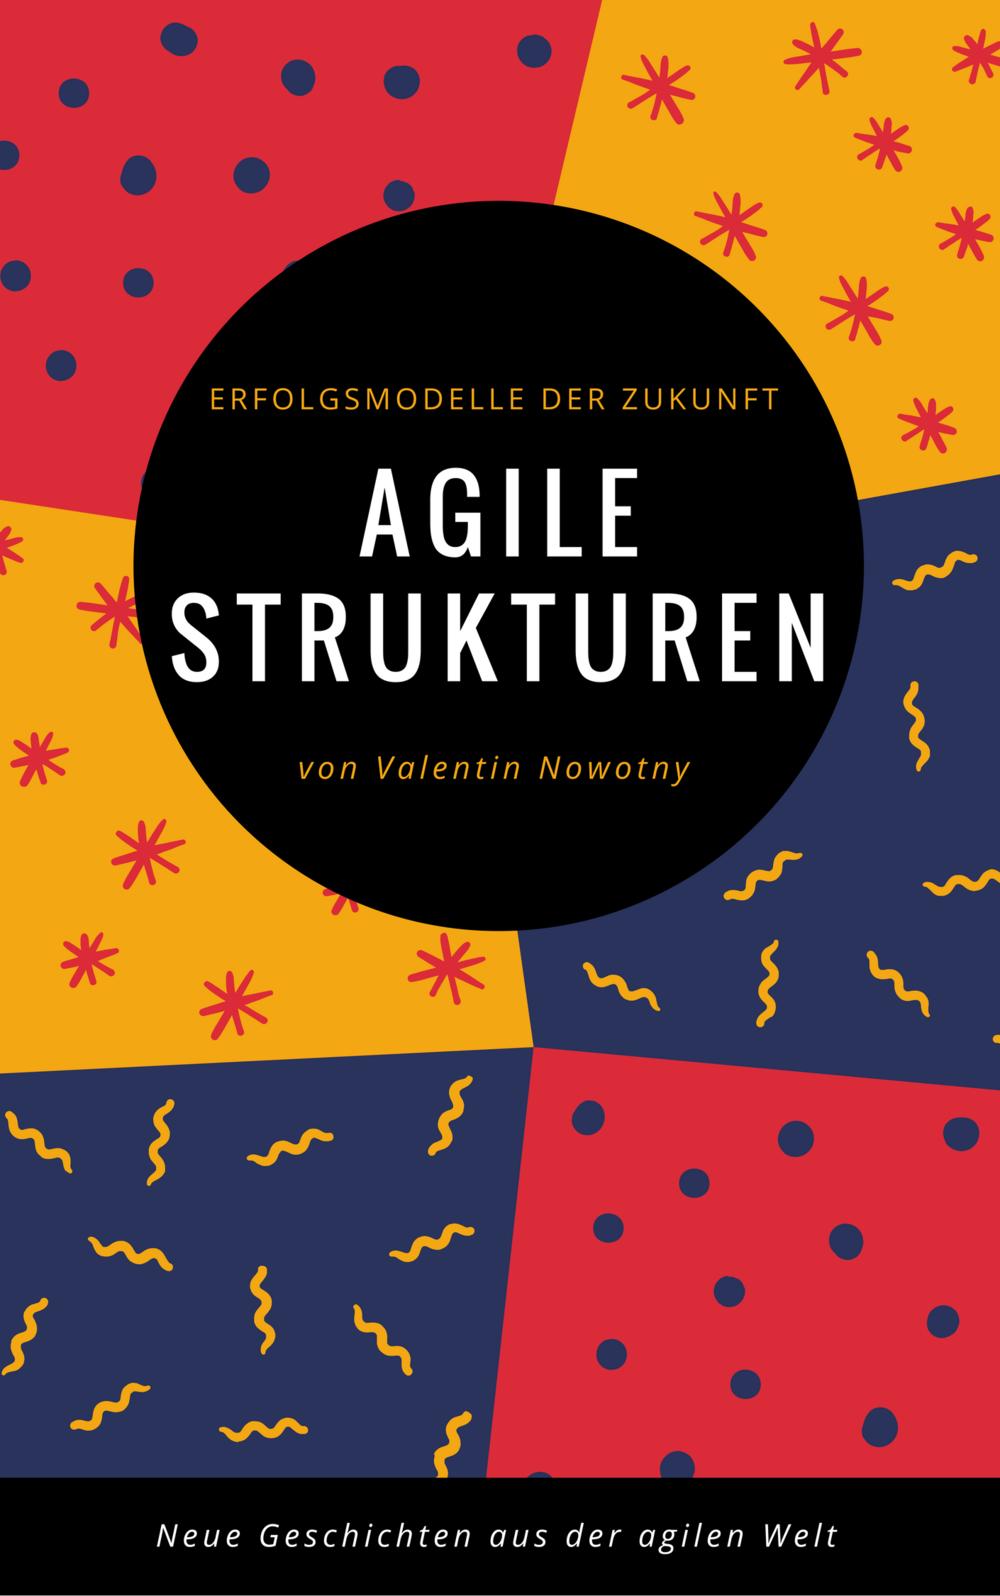 Agile Strukturen.png